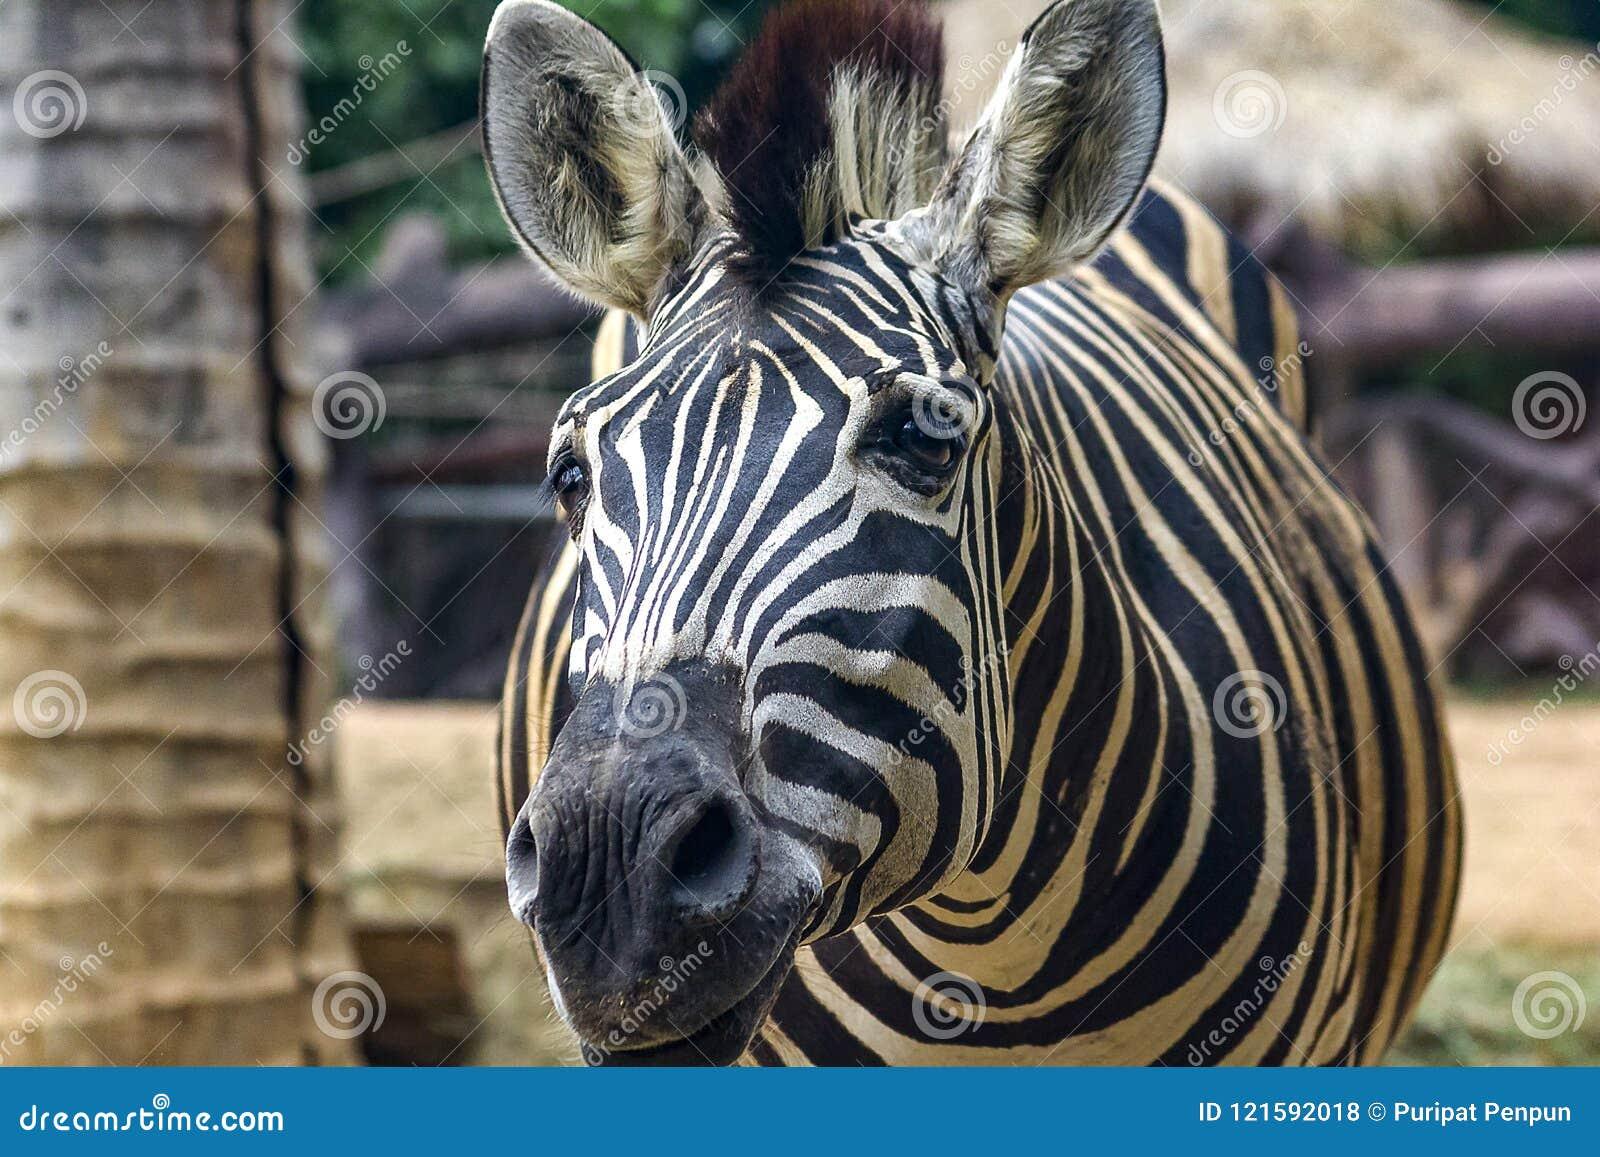 Zebra Head Patterns Of White Color Alternating Black. Stock Photo ...